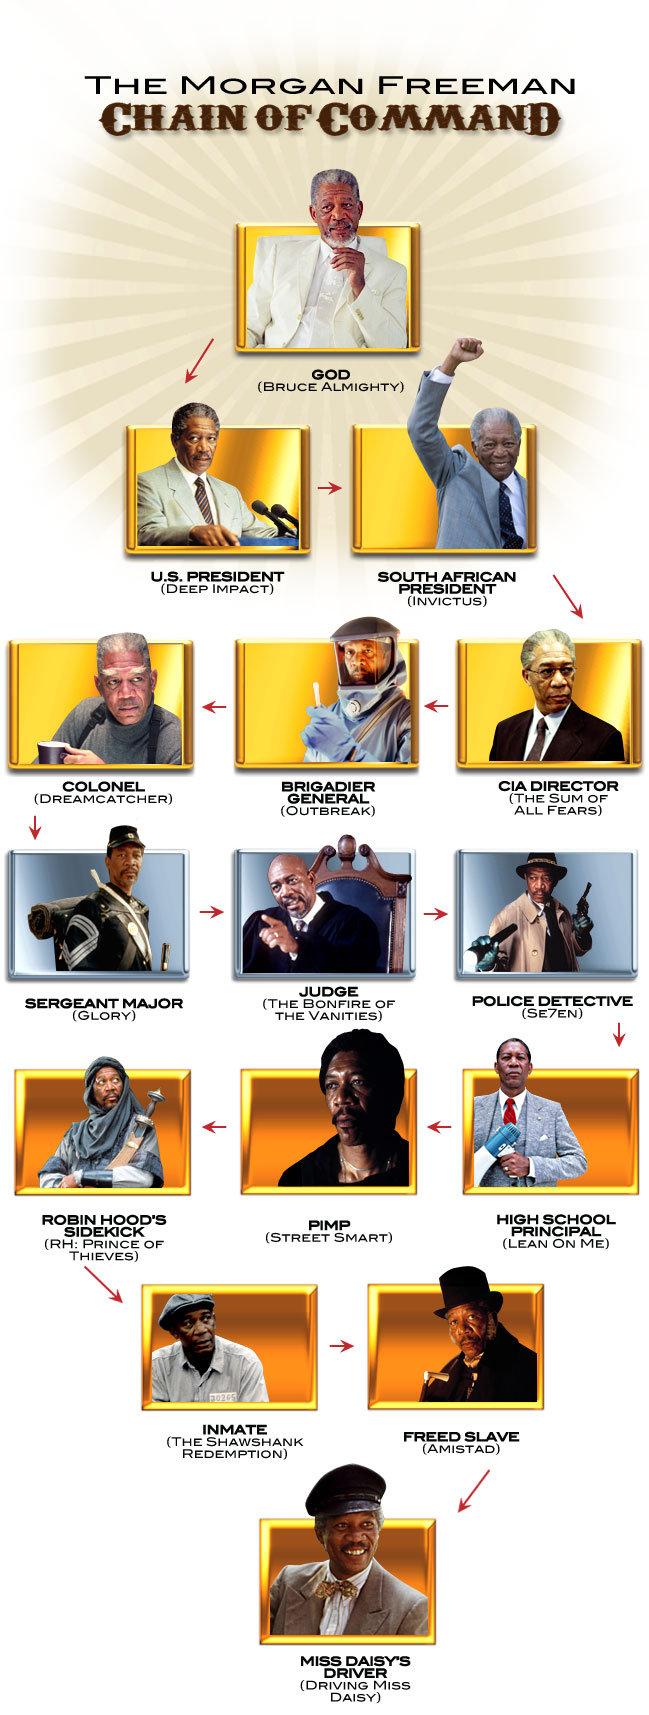 "The Legacy of Morgan Freeman. Morgan Freeman is Awesome. LLB. PRESIDENT SOUTH AFRICAN in EEP IMPACT} FREEAGENT BRIGADIER (HA. DOREI:' |"" CIR GENERAL {THE SLIM o Morgan Freeman is Awesome the man lol rofl"